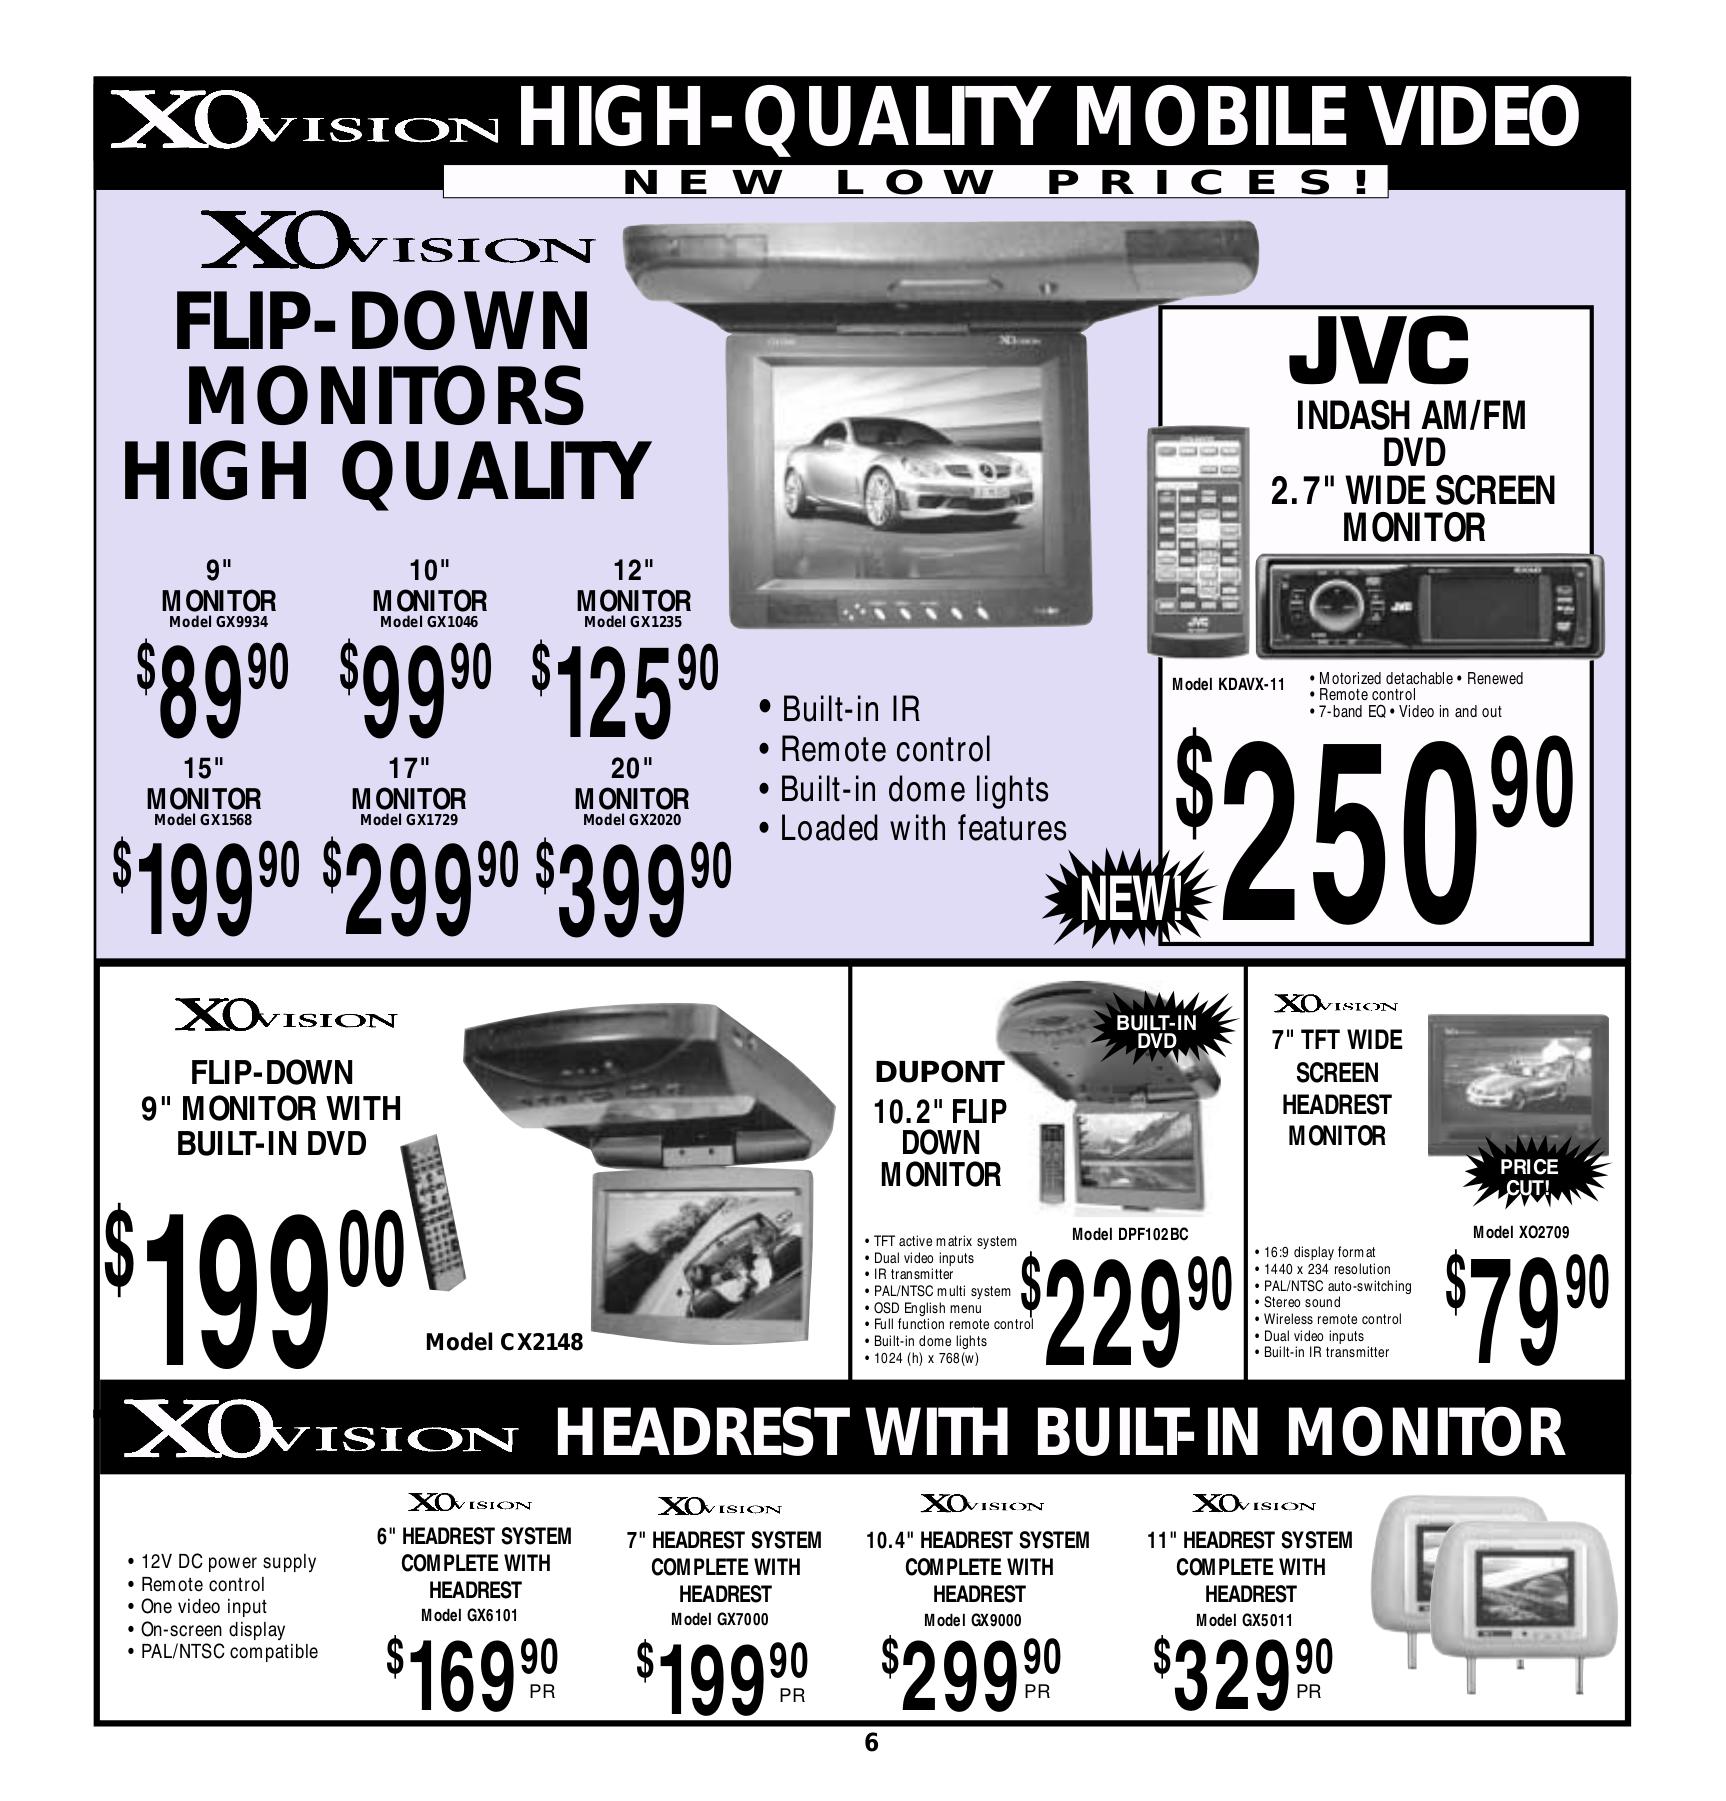 Pdf Manual For Pioneer Car Video Avhp5000dvd. Pioneer Car Video Avhp5000dvd Pdf Page Preview. Wiring. Wiring Diagram Pioneer Avh 2800x At Scoala.co